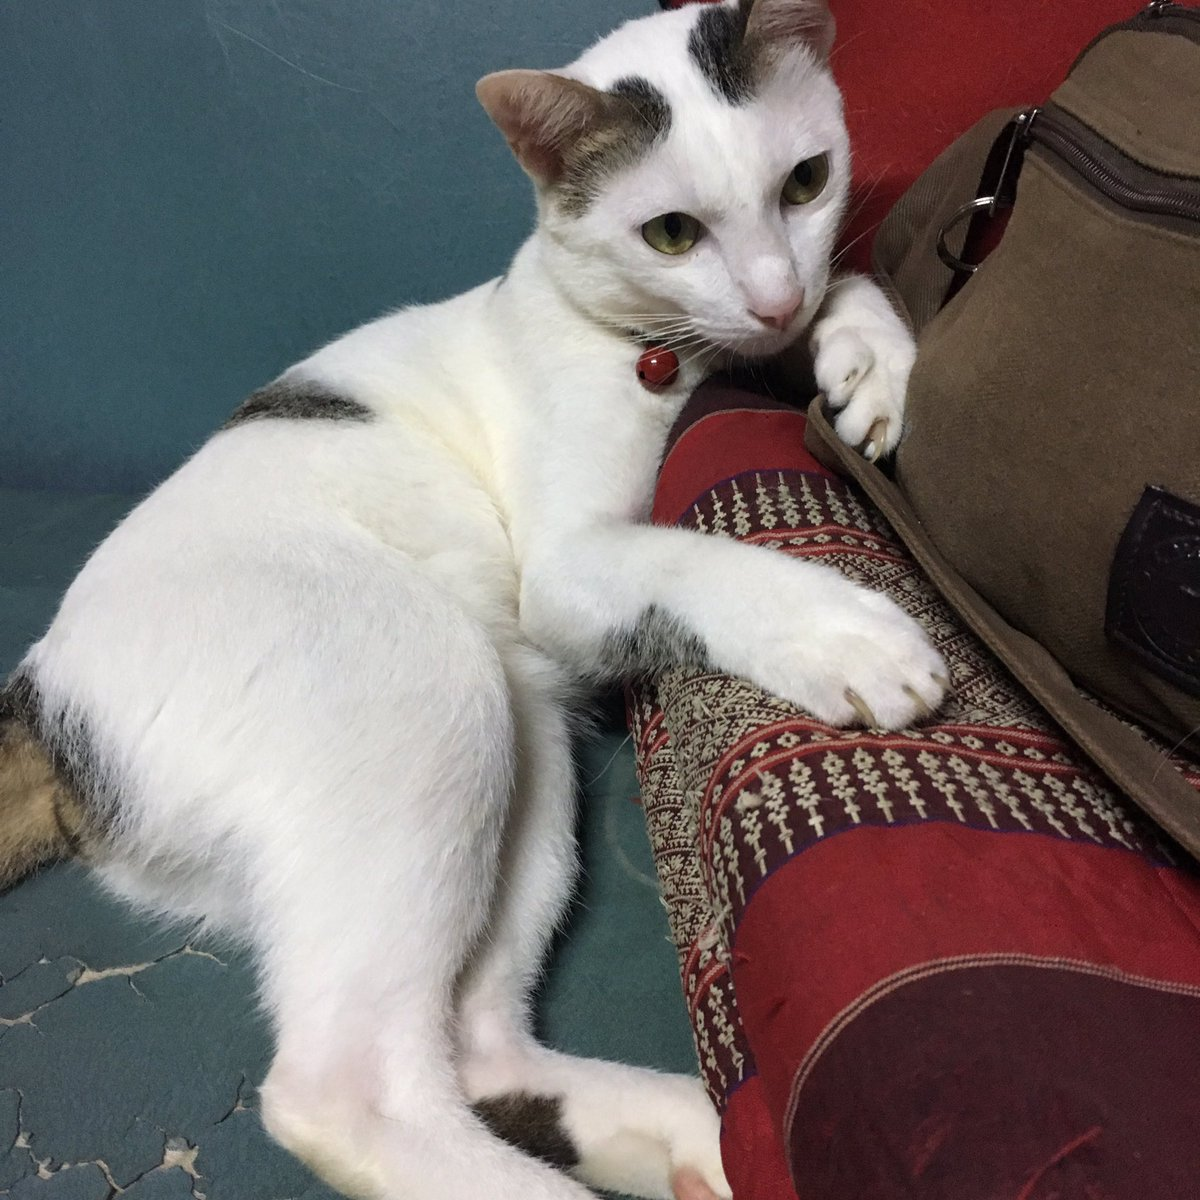 "fern」 على تويتر: ""นี่เป็นอดีตแมวหาบ้านที่โดนคนจองเท  ตอนแรกแย่งกันจะเป็นจะตายเพราะคิดว่าเป็นแมวเก้าแต้ม (เสิ่นเจิ้น) น่ะ 😂  แต่น้องก็แสดงออกมาตั้งแต่ต้นว่าจะไม่ออกจากบ้านนี้ไปไหน …ก็อยู่ด้วยกันล่ะนะ  เด็กดื้อ #แมวเด็กสู้ชีวิต #แมวเป็นสัตว์มุ้งมิ้ง ..."